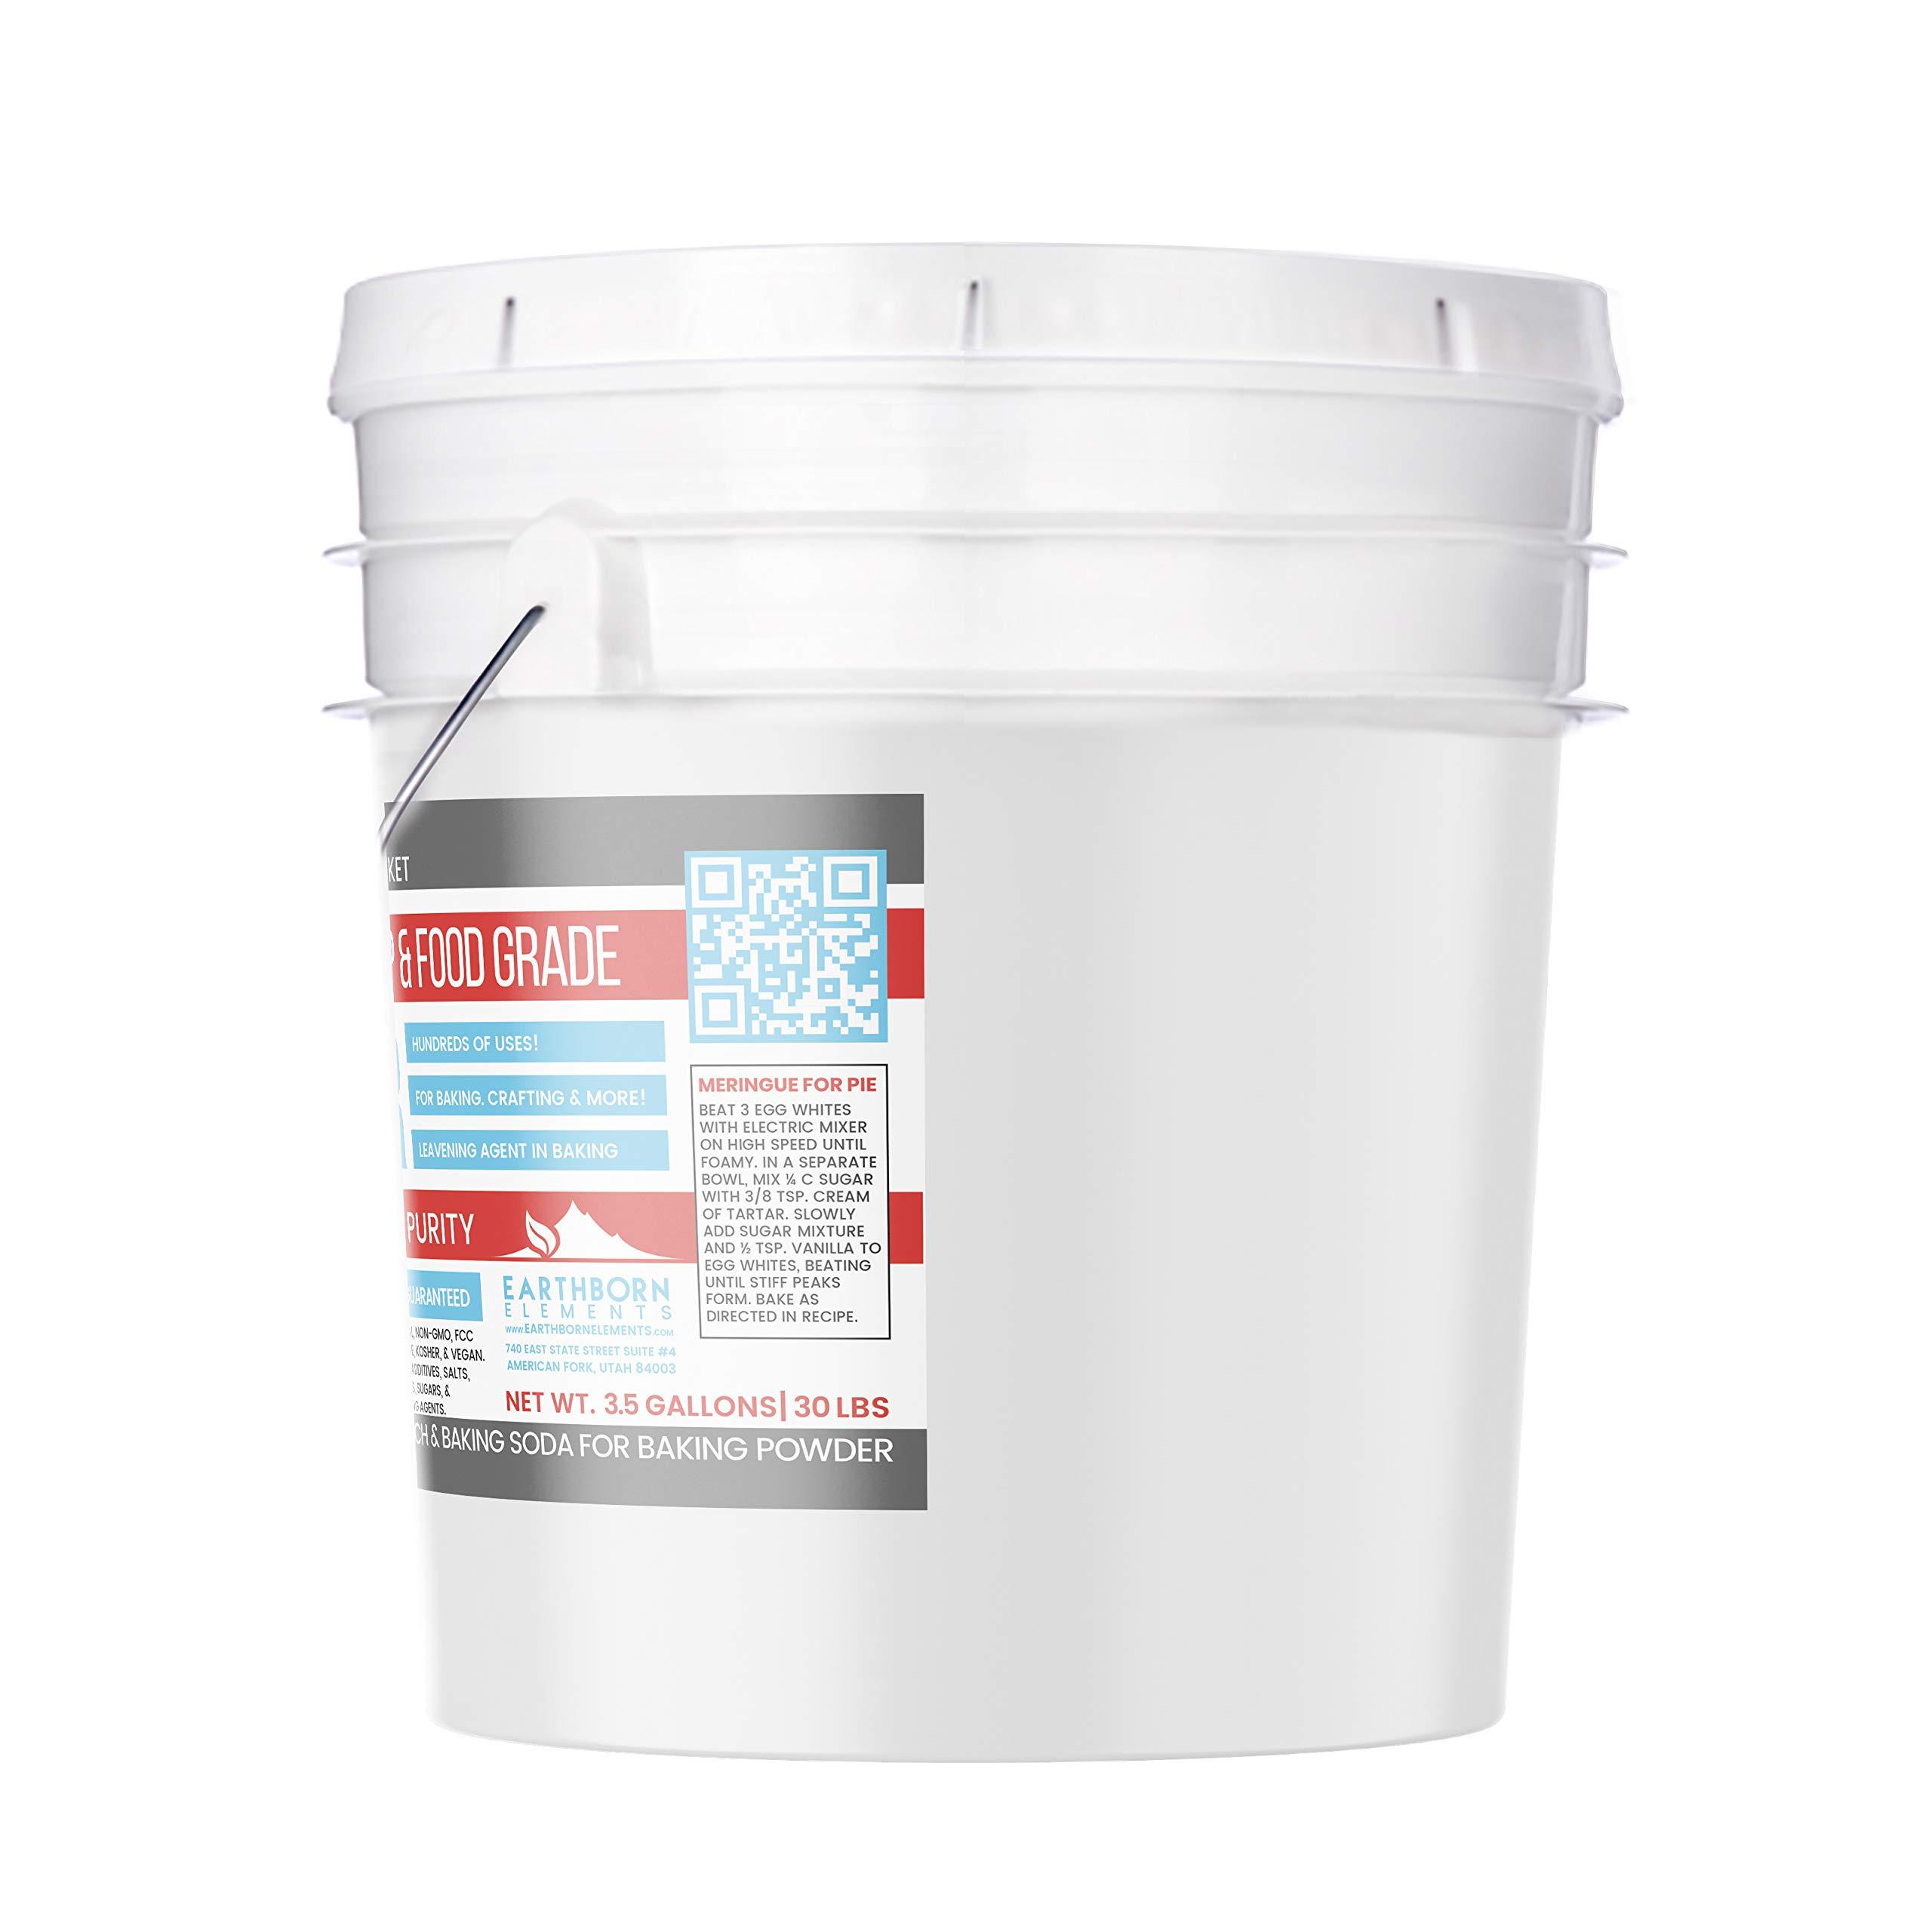 Cream of Tartar (3.5 Gallon) by Earthborn Elements, Resealable Bucket, Highest Purity, Baking Additive, Non-GMO, Kosher, Gluten-Free, All-Natural, DIY Bath Bombs by Earthborn Elements (Image #2)